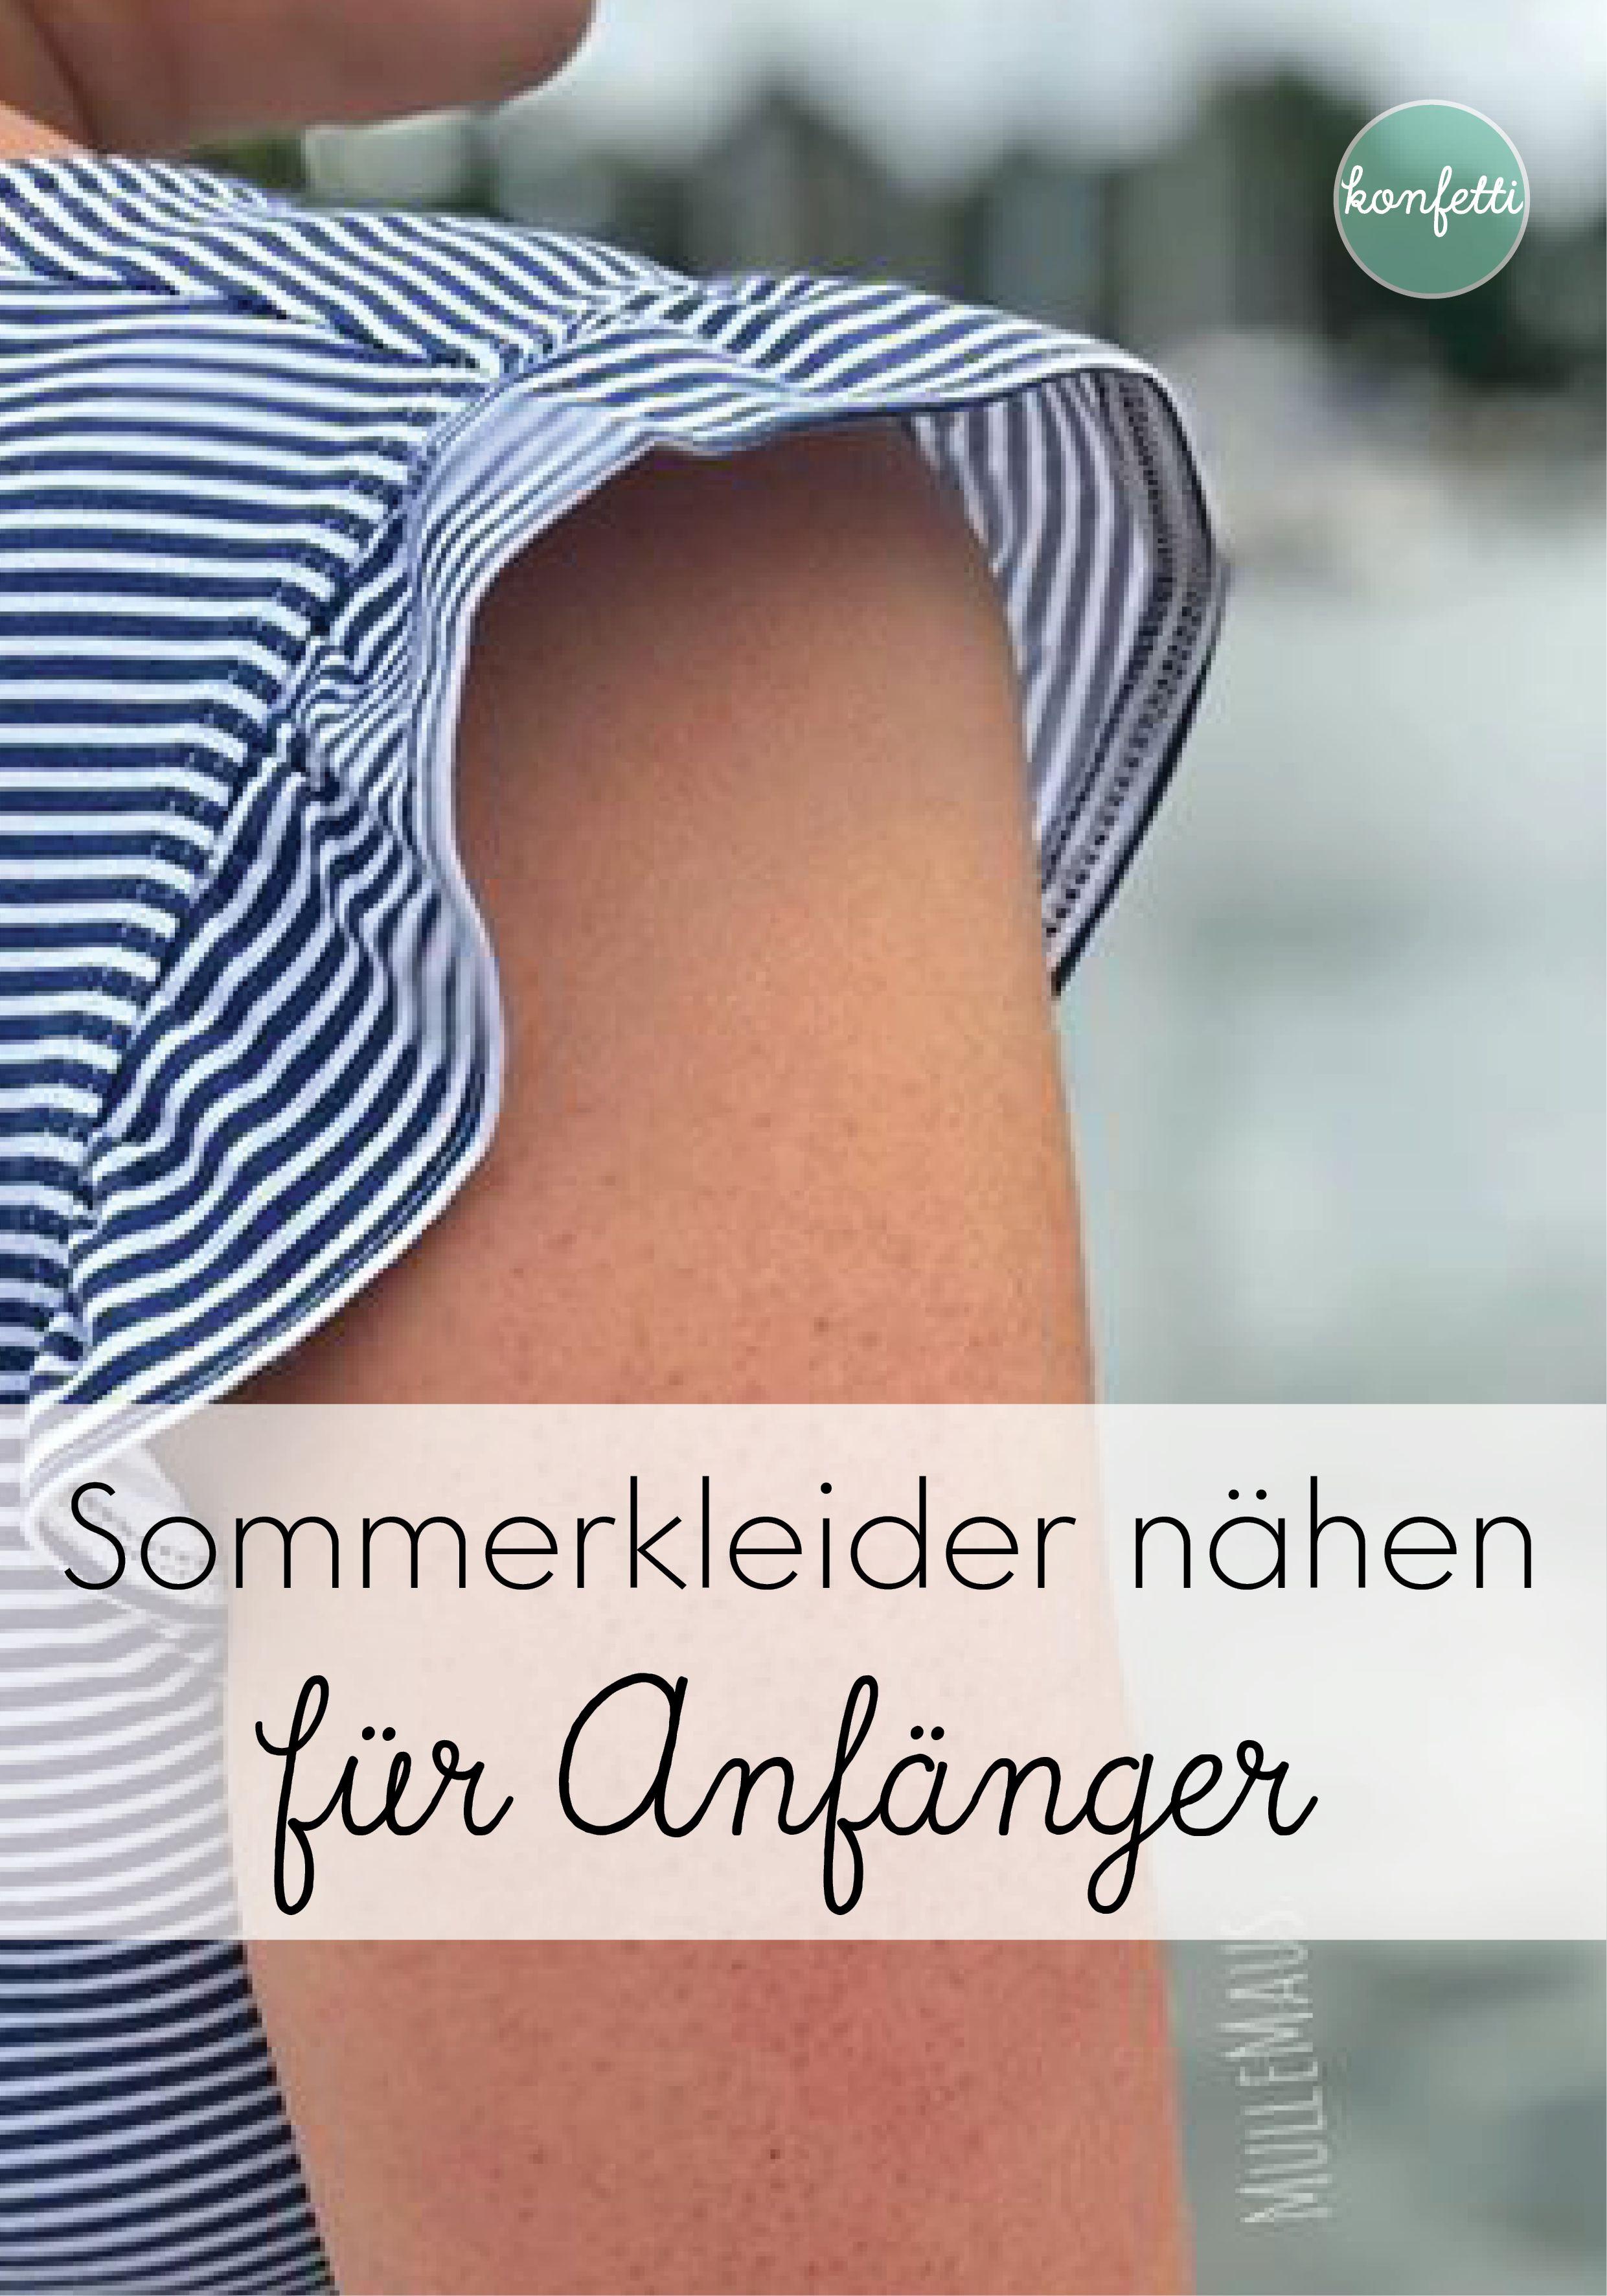 Schnittmuster fürs perfekte Sommerkleid #schnittmusterzumkleidernähen